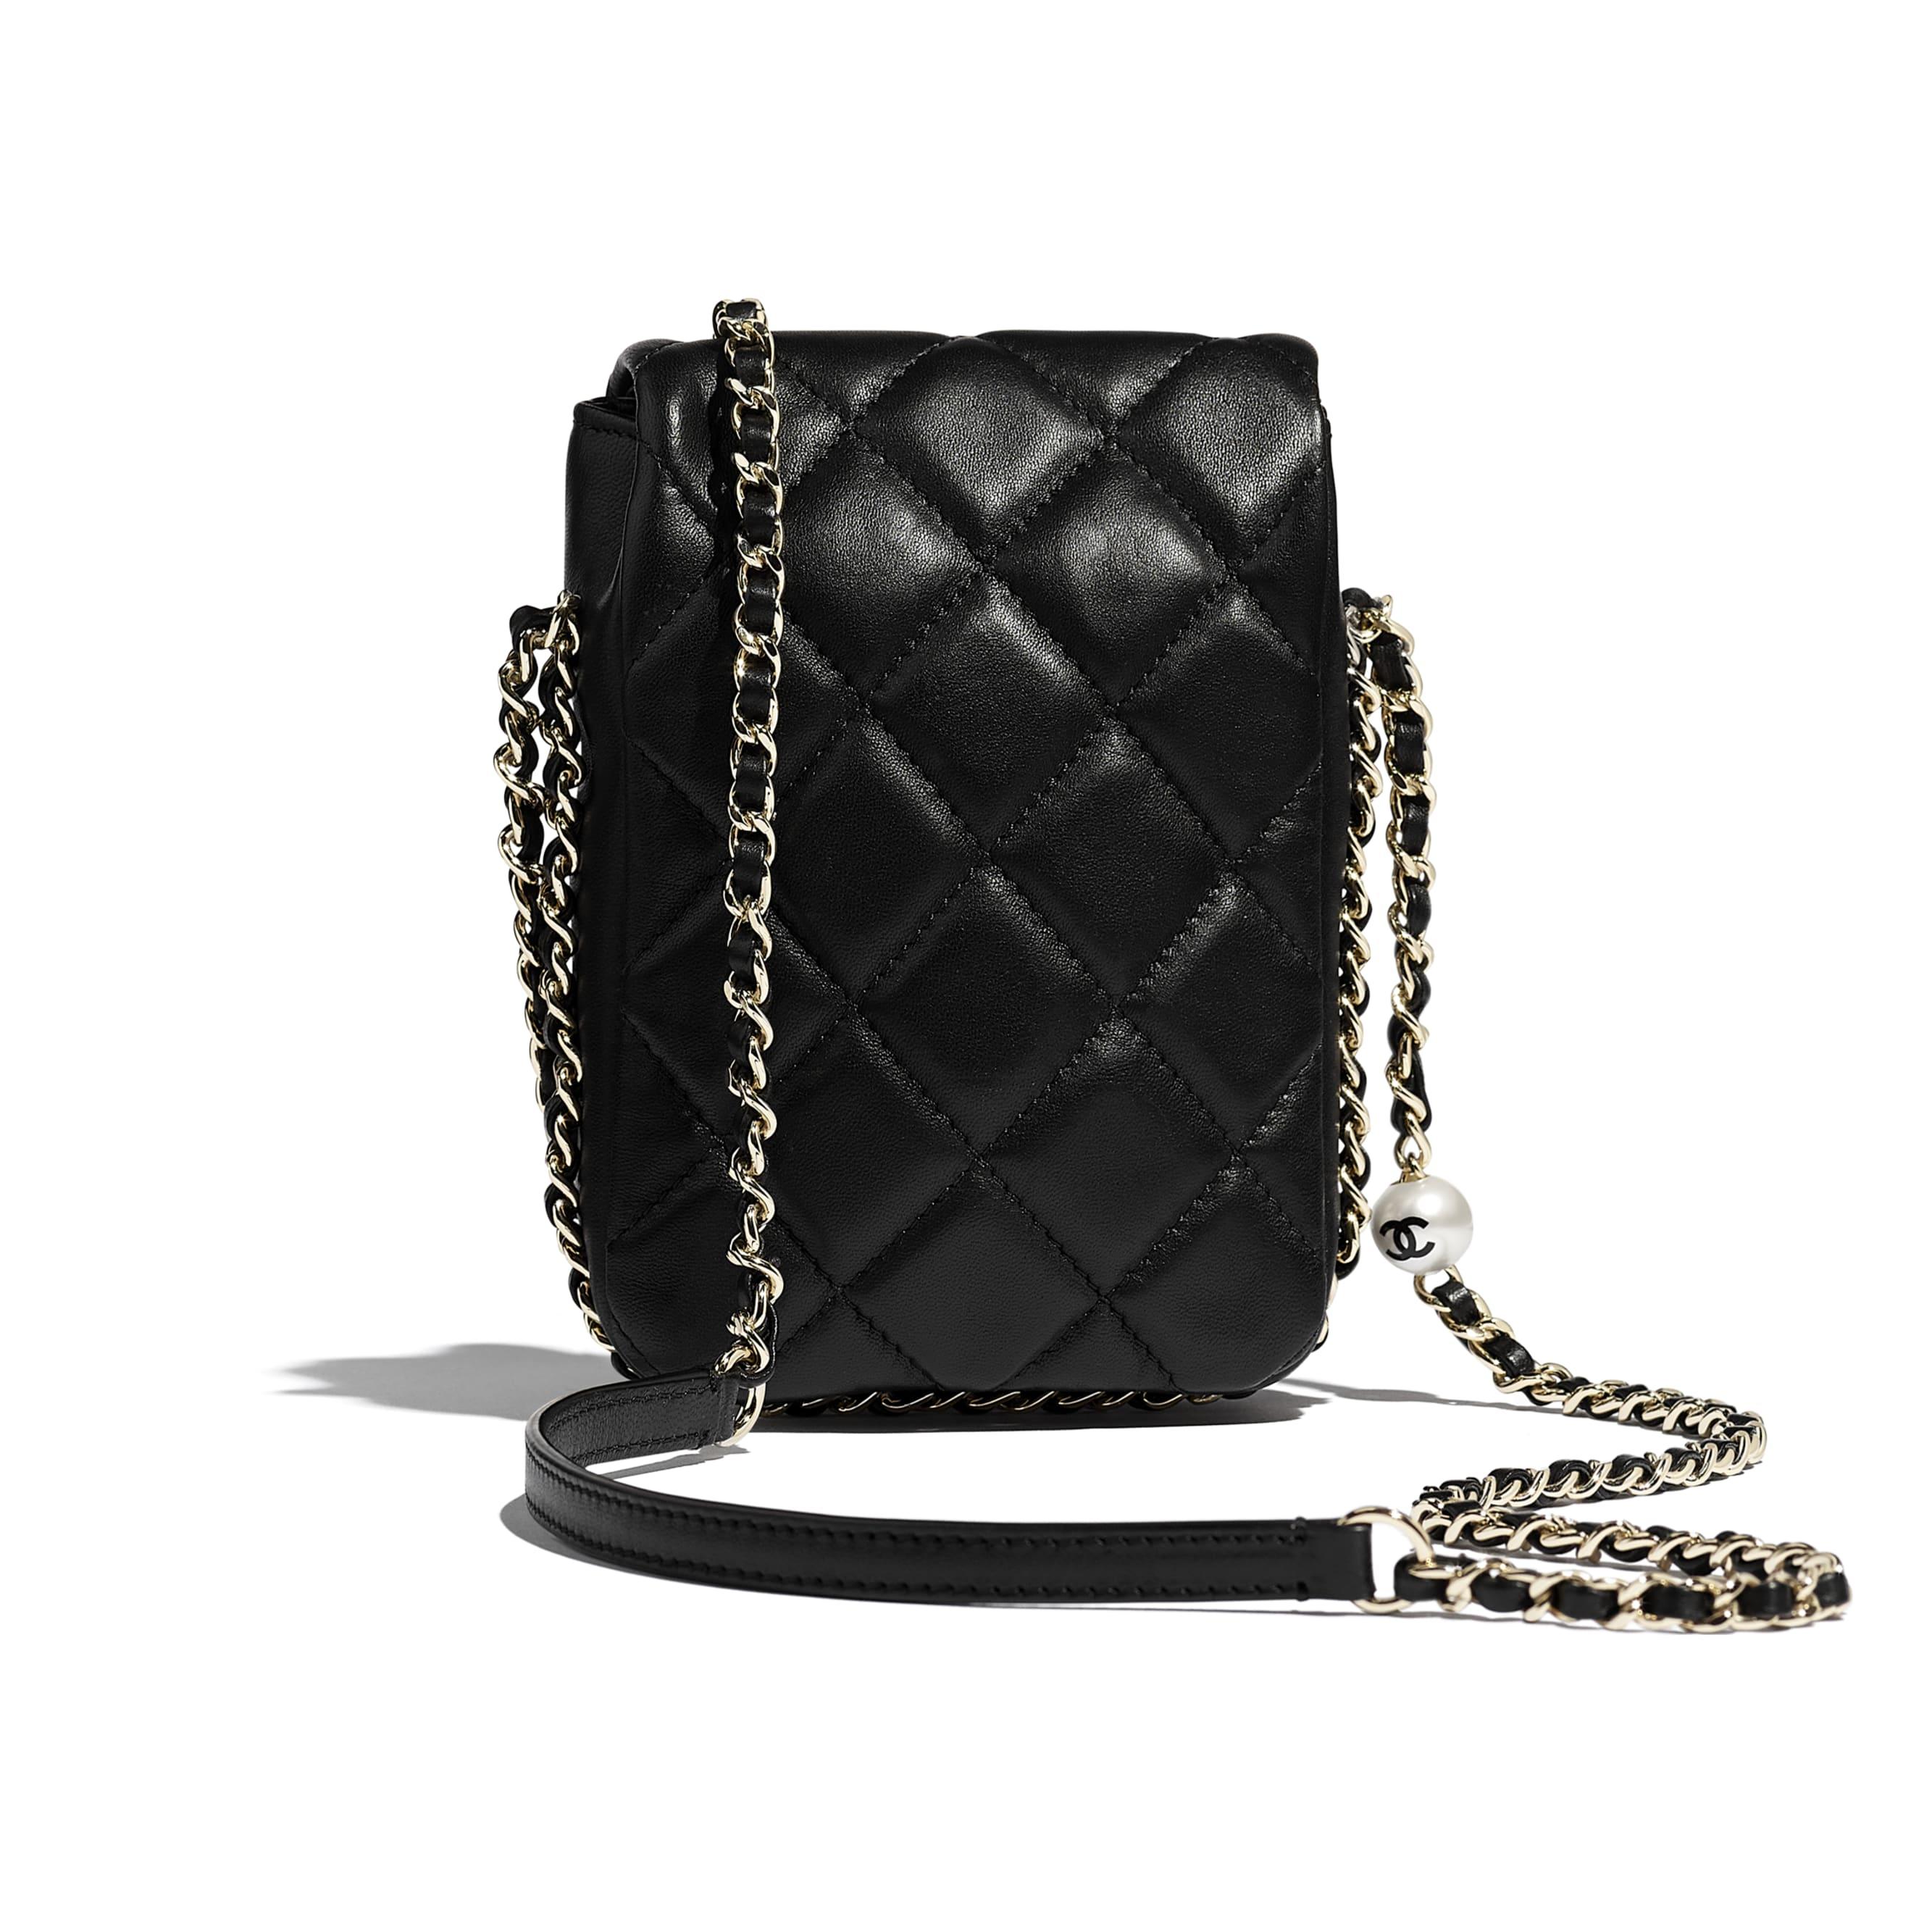 Small Flap Bag - Black - Lambskin, Imitation Pearls & Gold-Tone Metal - CHANEL - Alternative view - see standard sized version